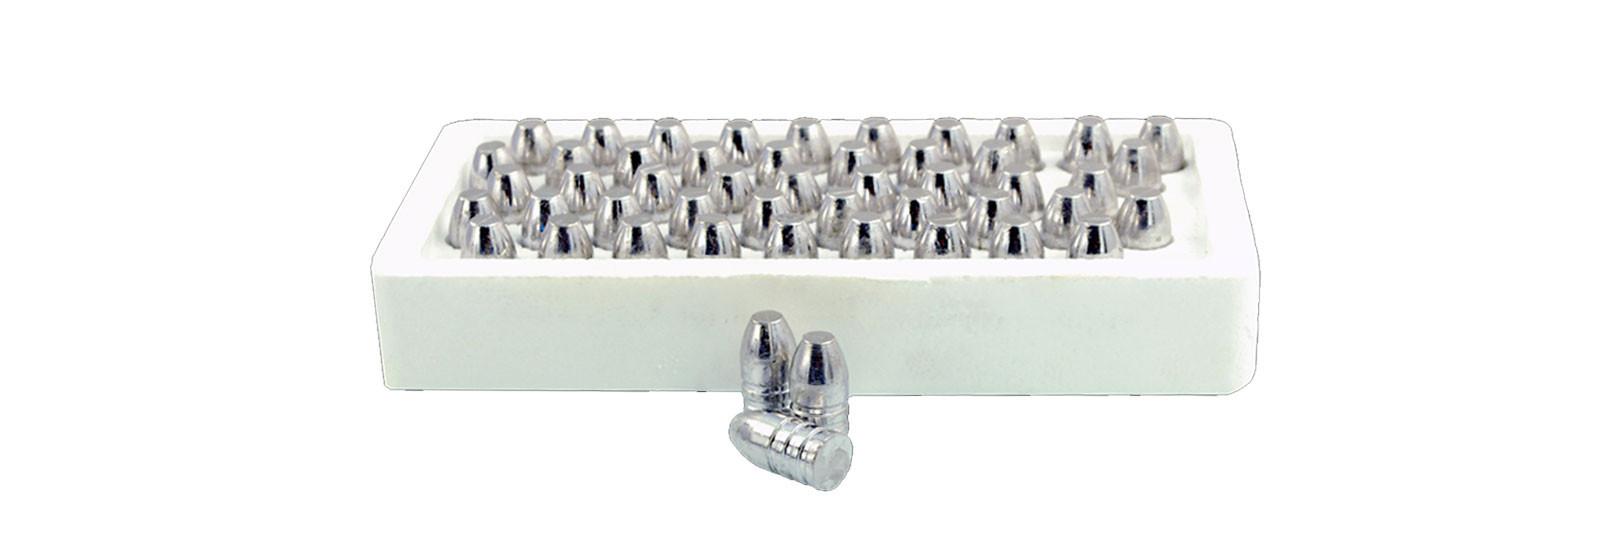 50 conical lead balls.500/450 grs